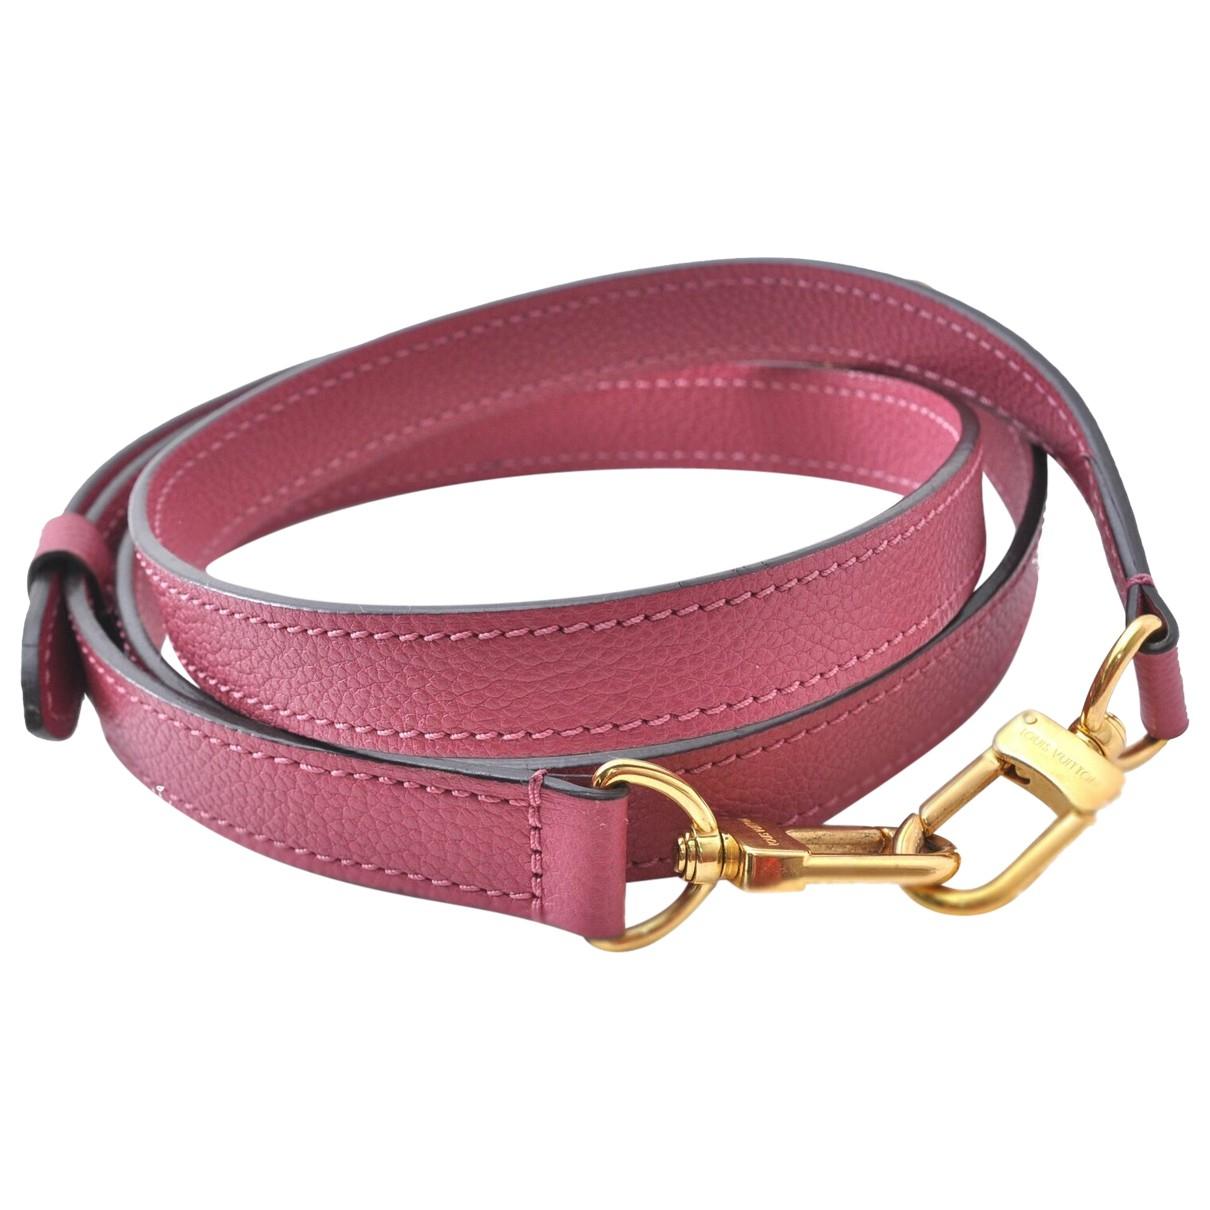 Louis Vuitton N Pink Leather handbag for Women N